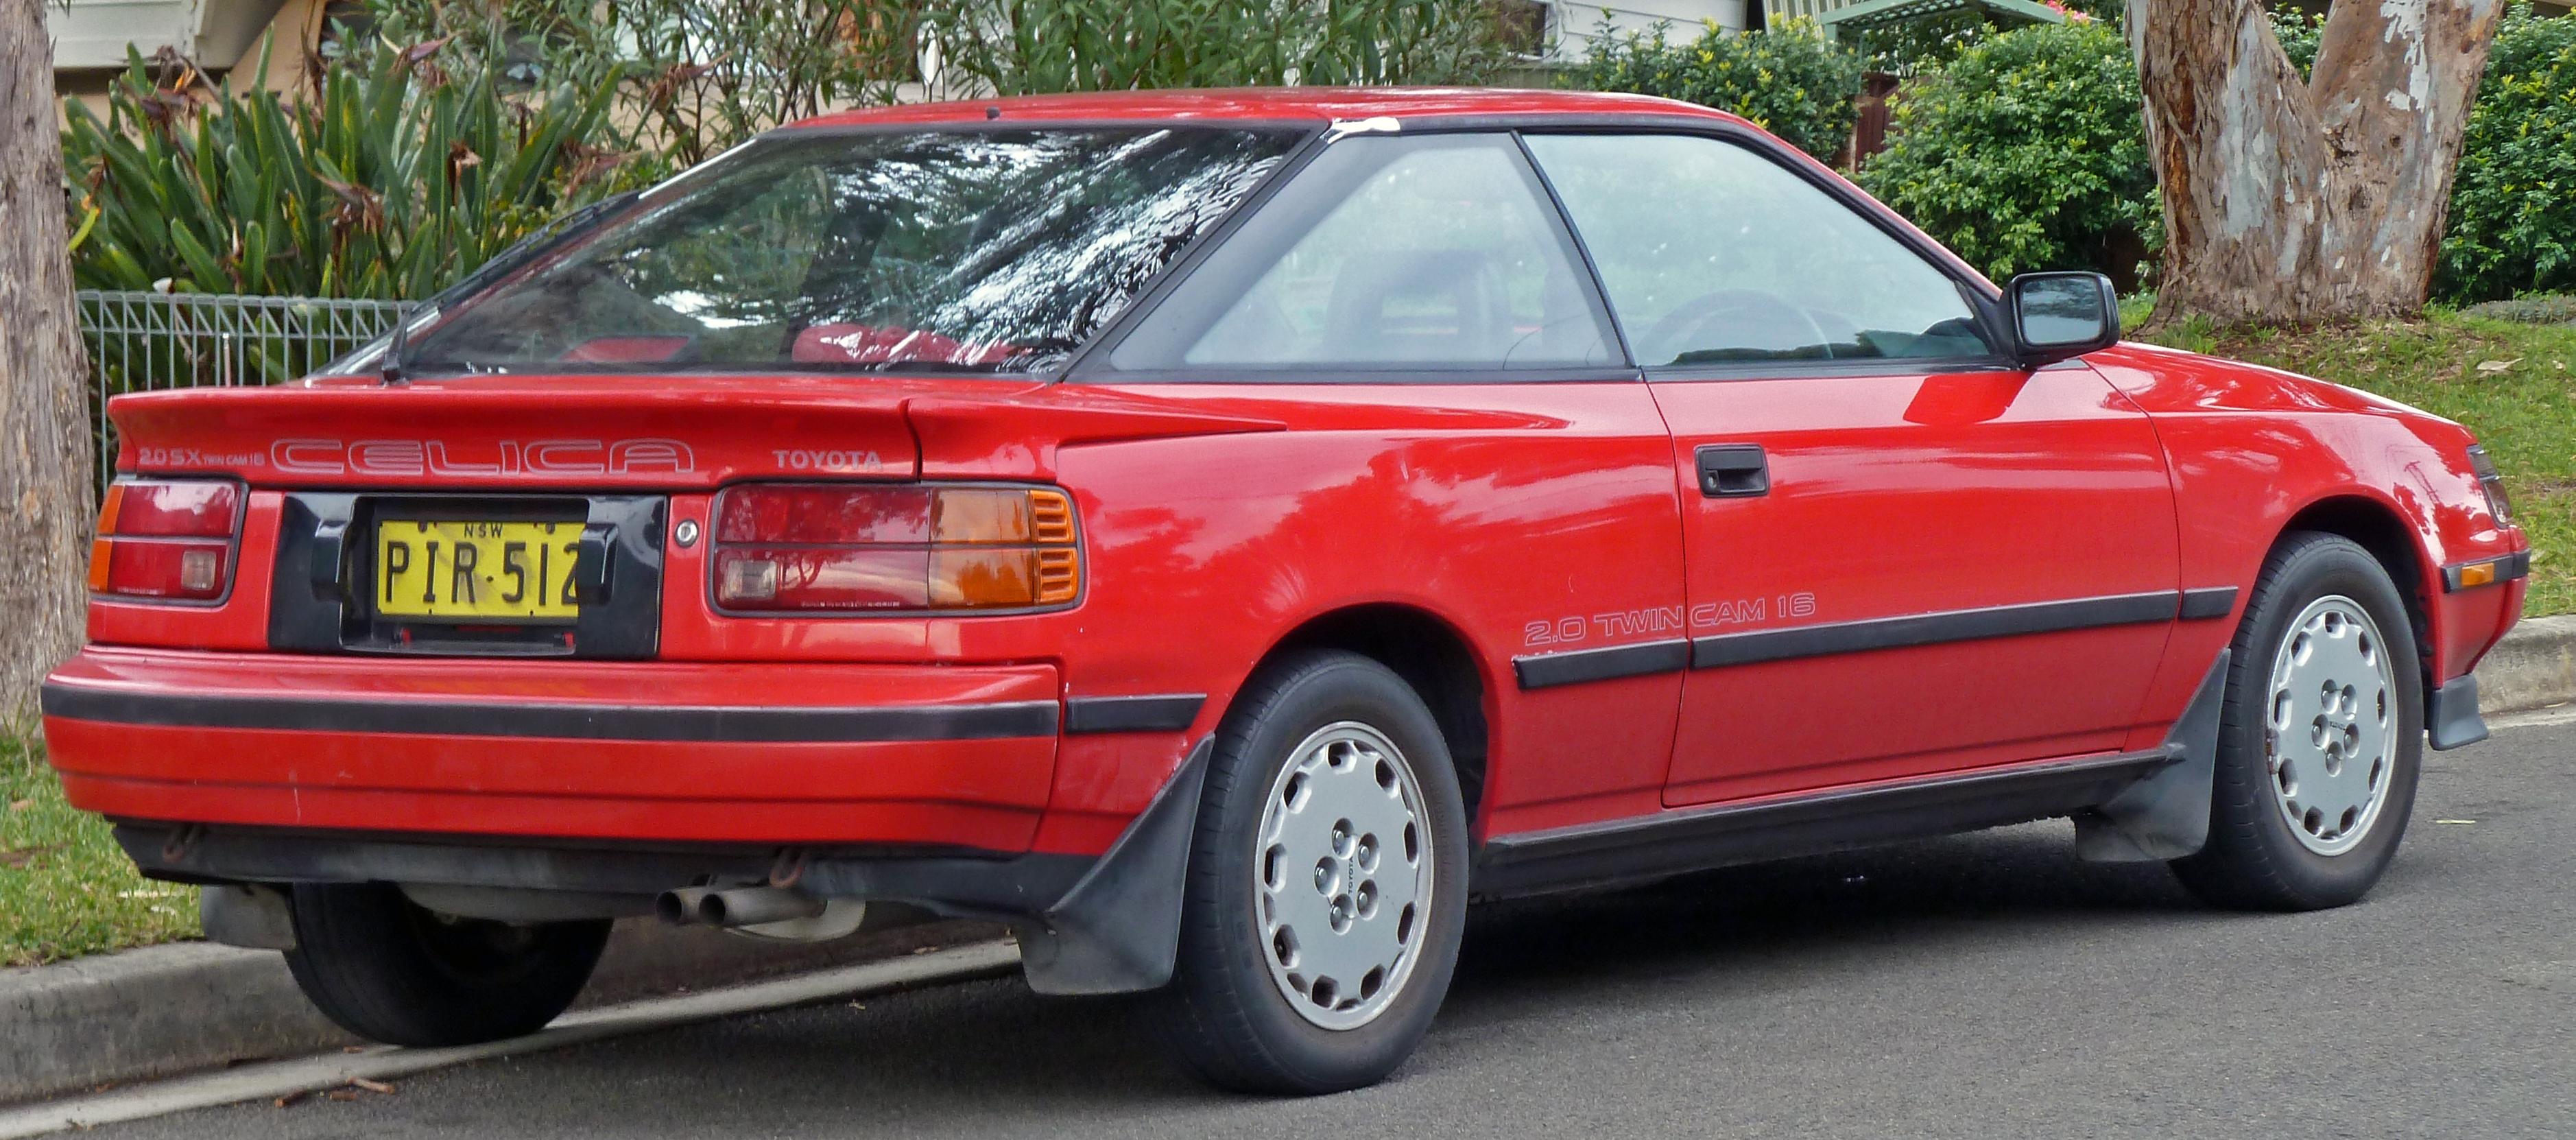 File 1987 1989 Toyota Celica St162 Sx Liftback 02 Jpg